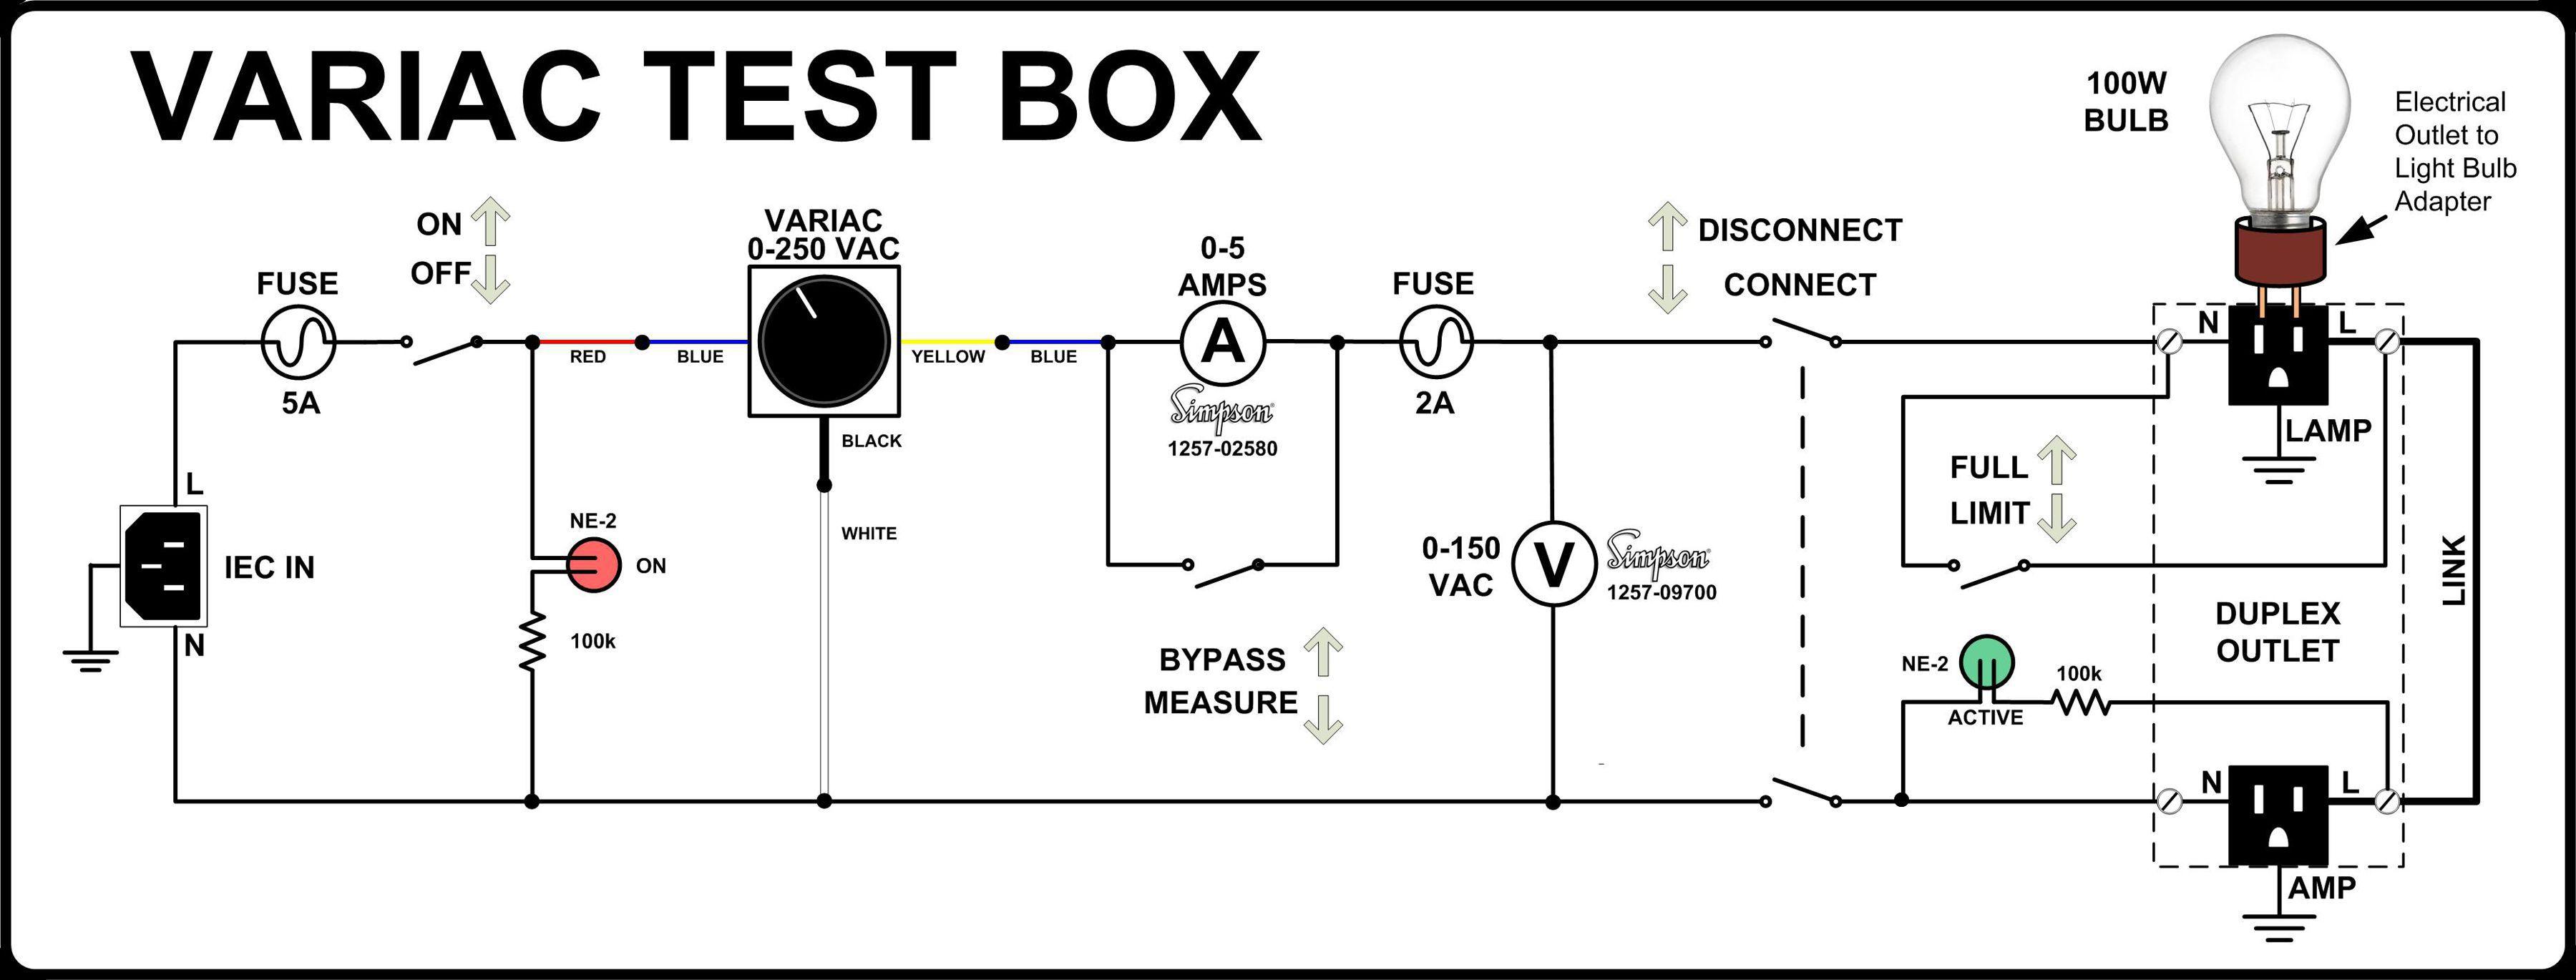 variable transformer wiring diagram basic electronics wiring diagram Transformer Wiring variac variable transformer wiring diagram wiring schematic diagramvariable transformer wiring diagram wiring diagram powerstat variable transformer